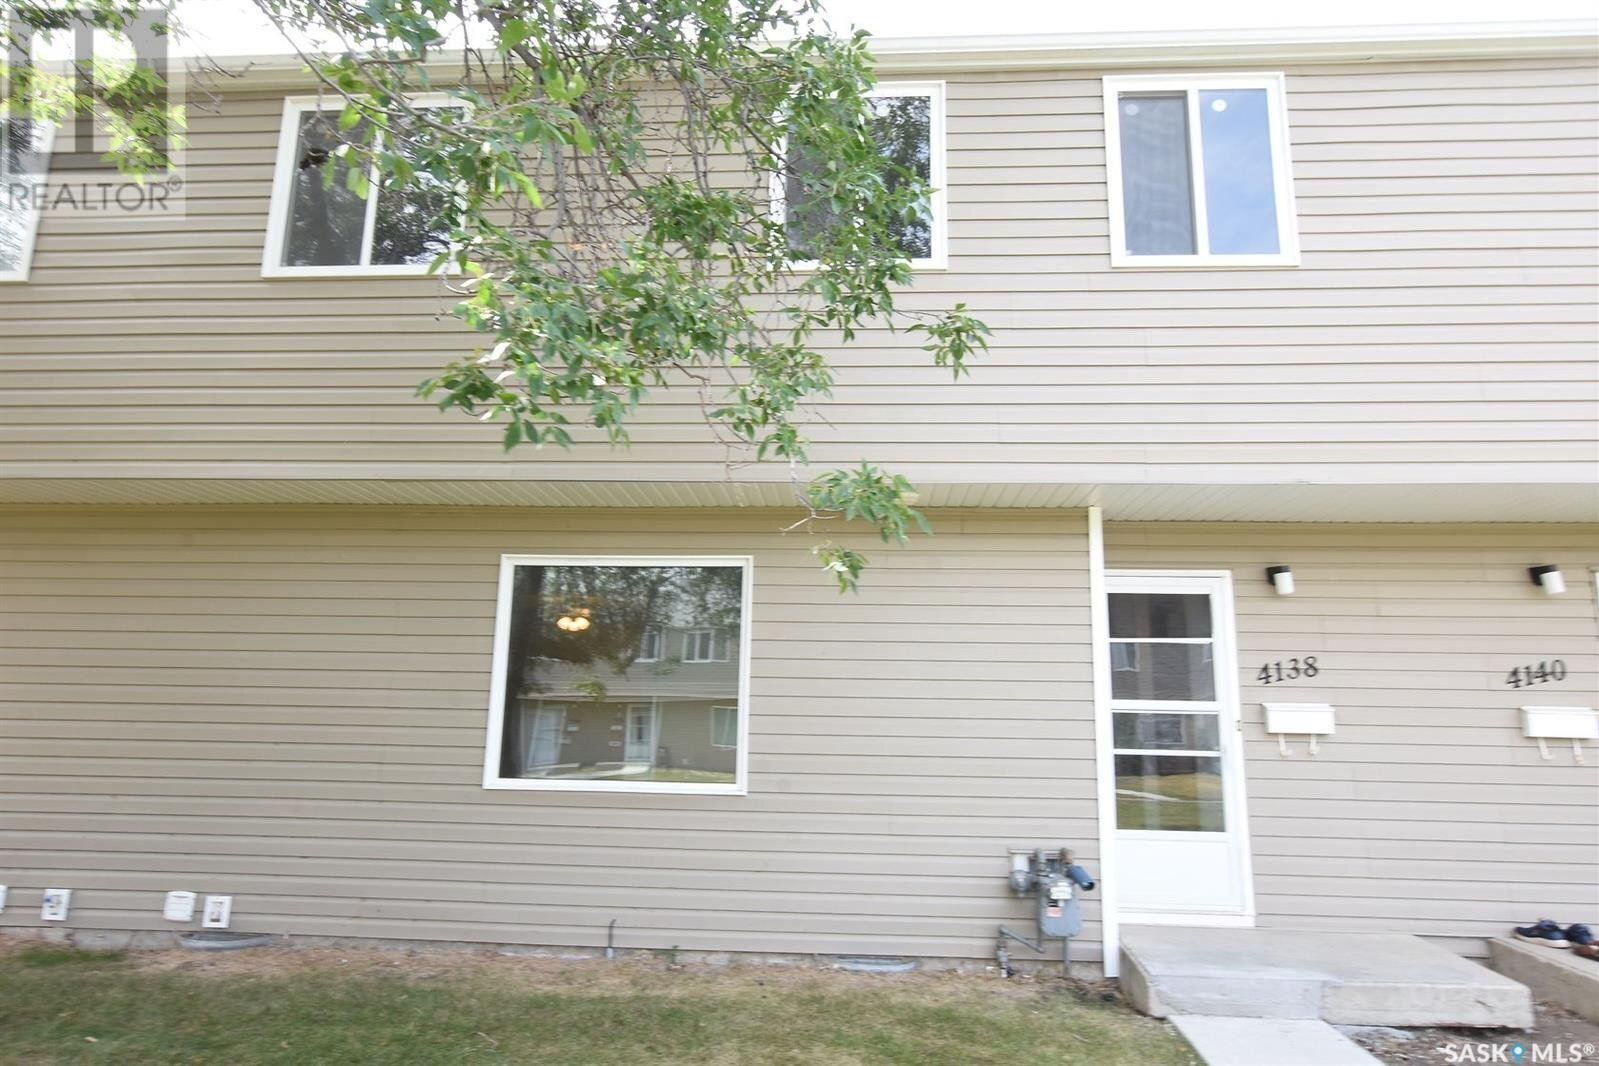 Townhouse for sale at 4138 Castle Rd Regina Saskatchewan - MLS: SK824039